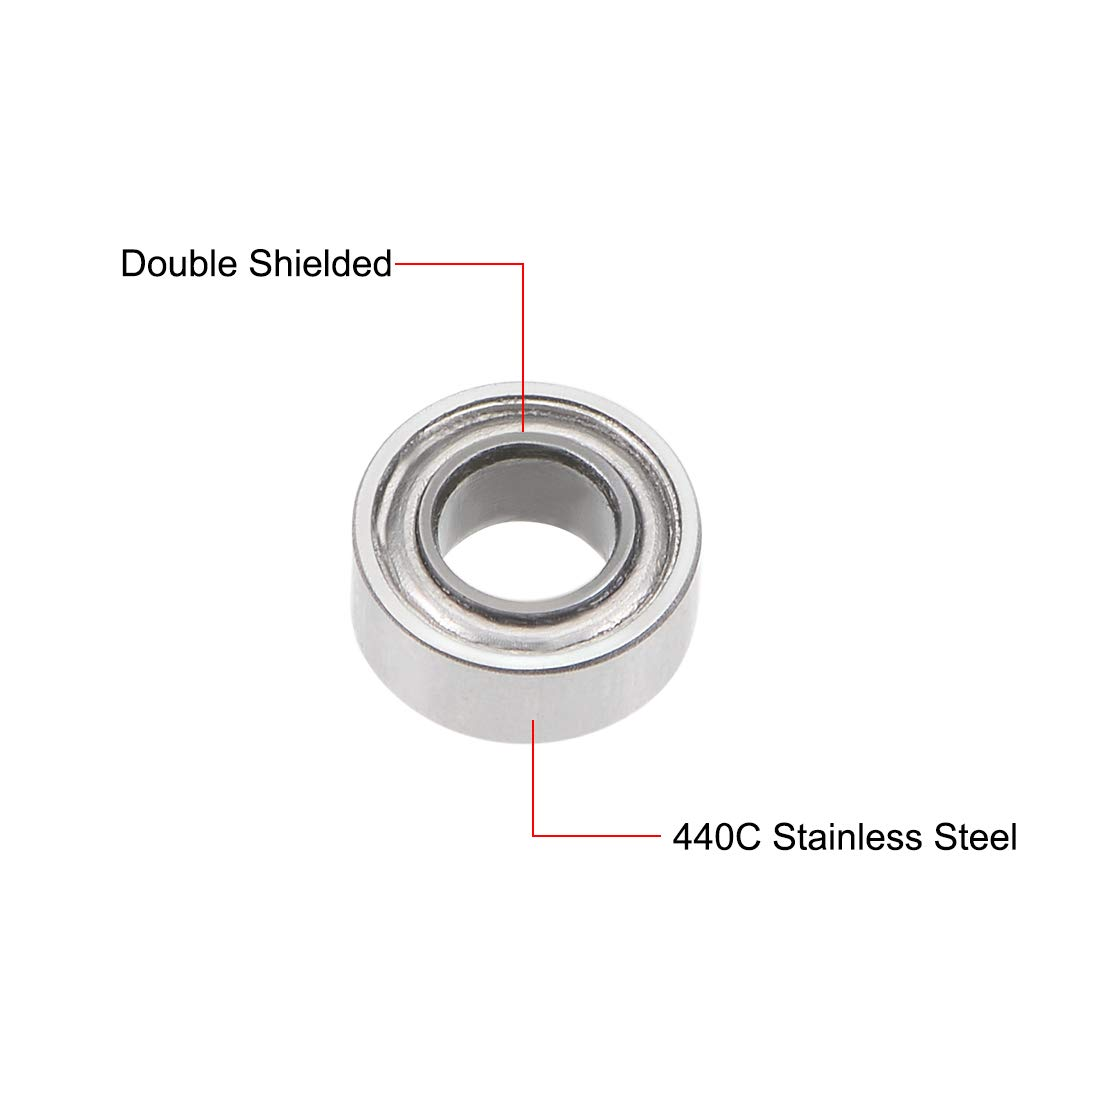 8x14x4 mm 440C Stainless Steel Ball Bearing Bearings SMR148ZZ MR148ZZ 5 PCS